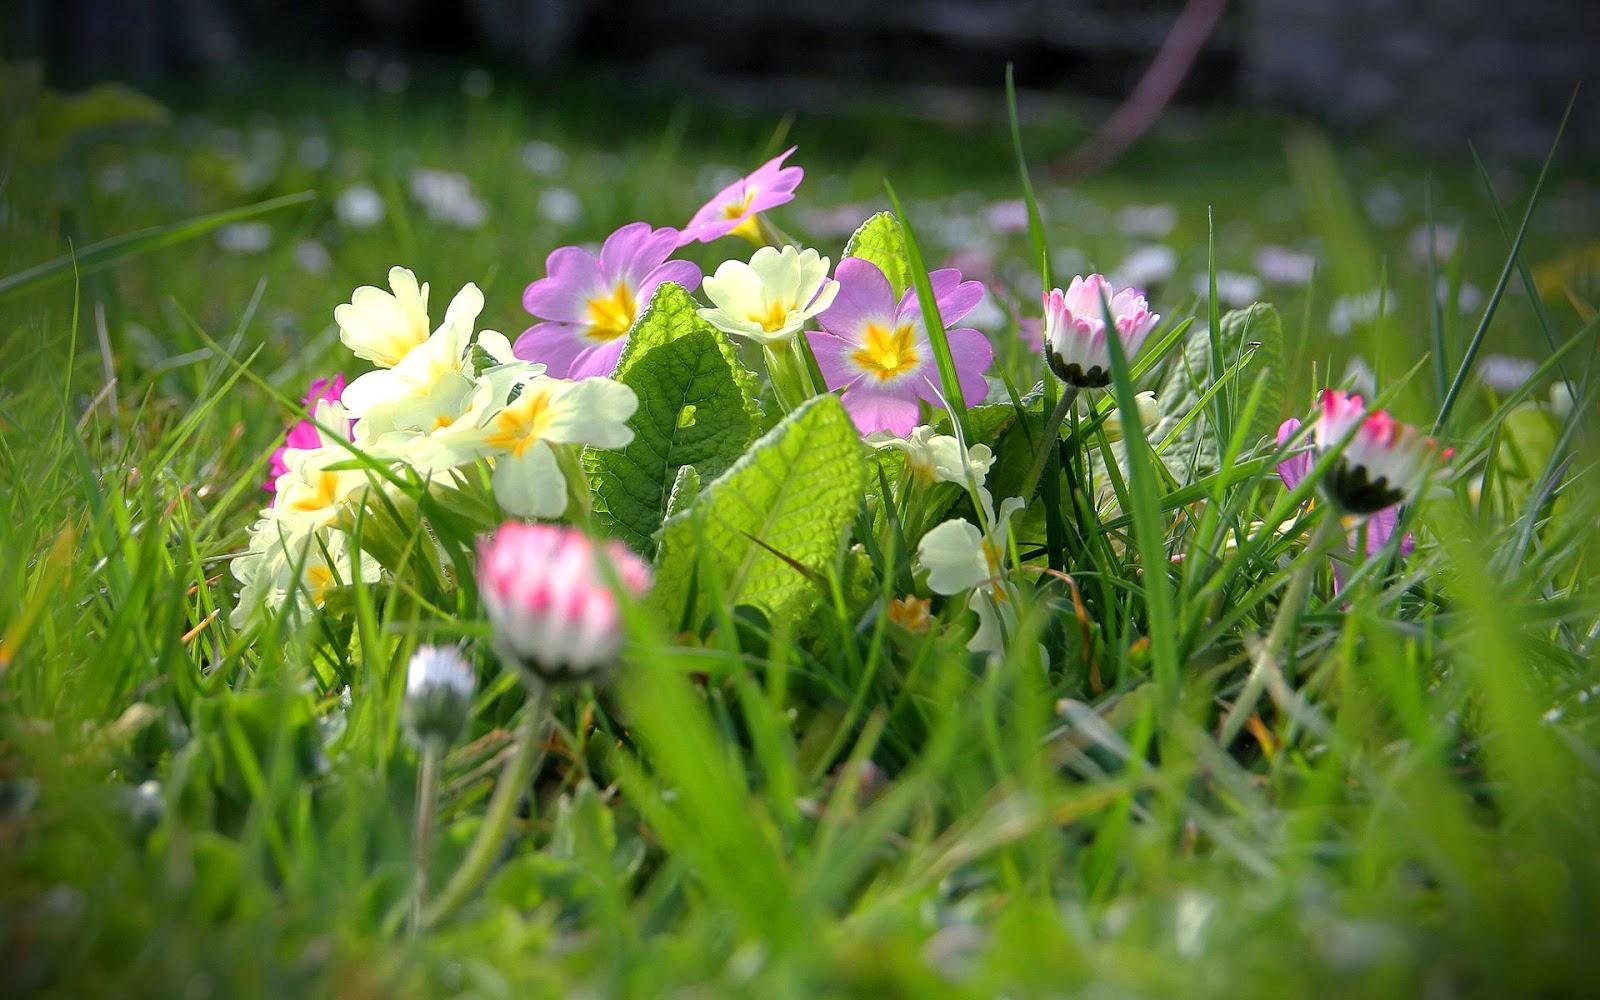 Bloemen in bloei in de lente